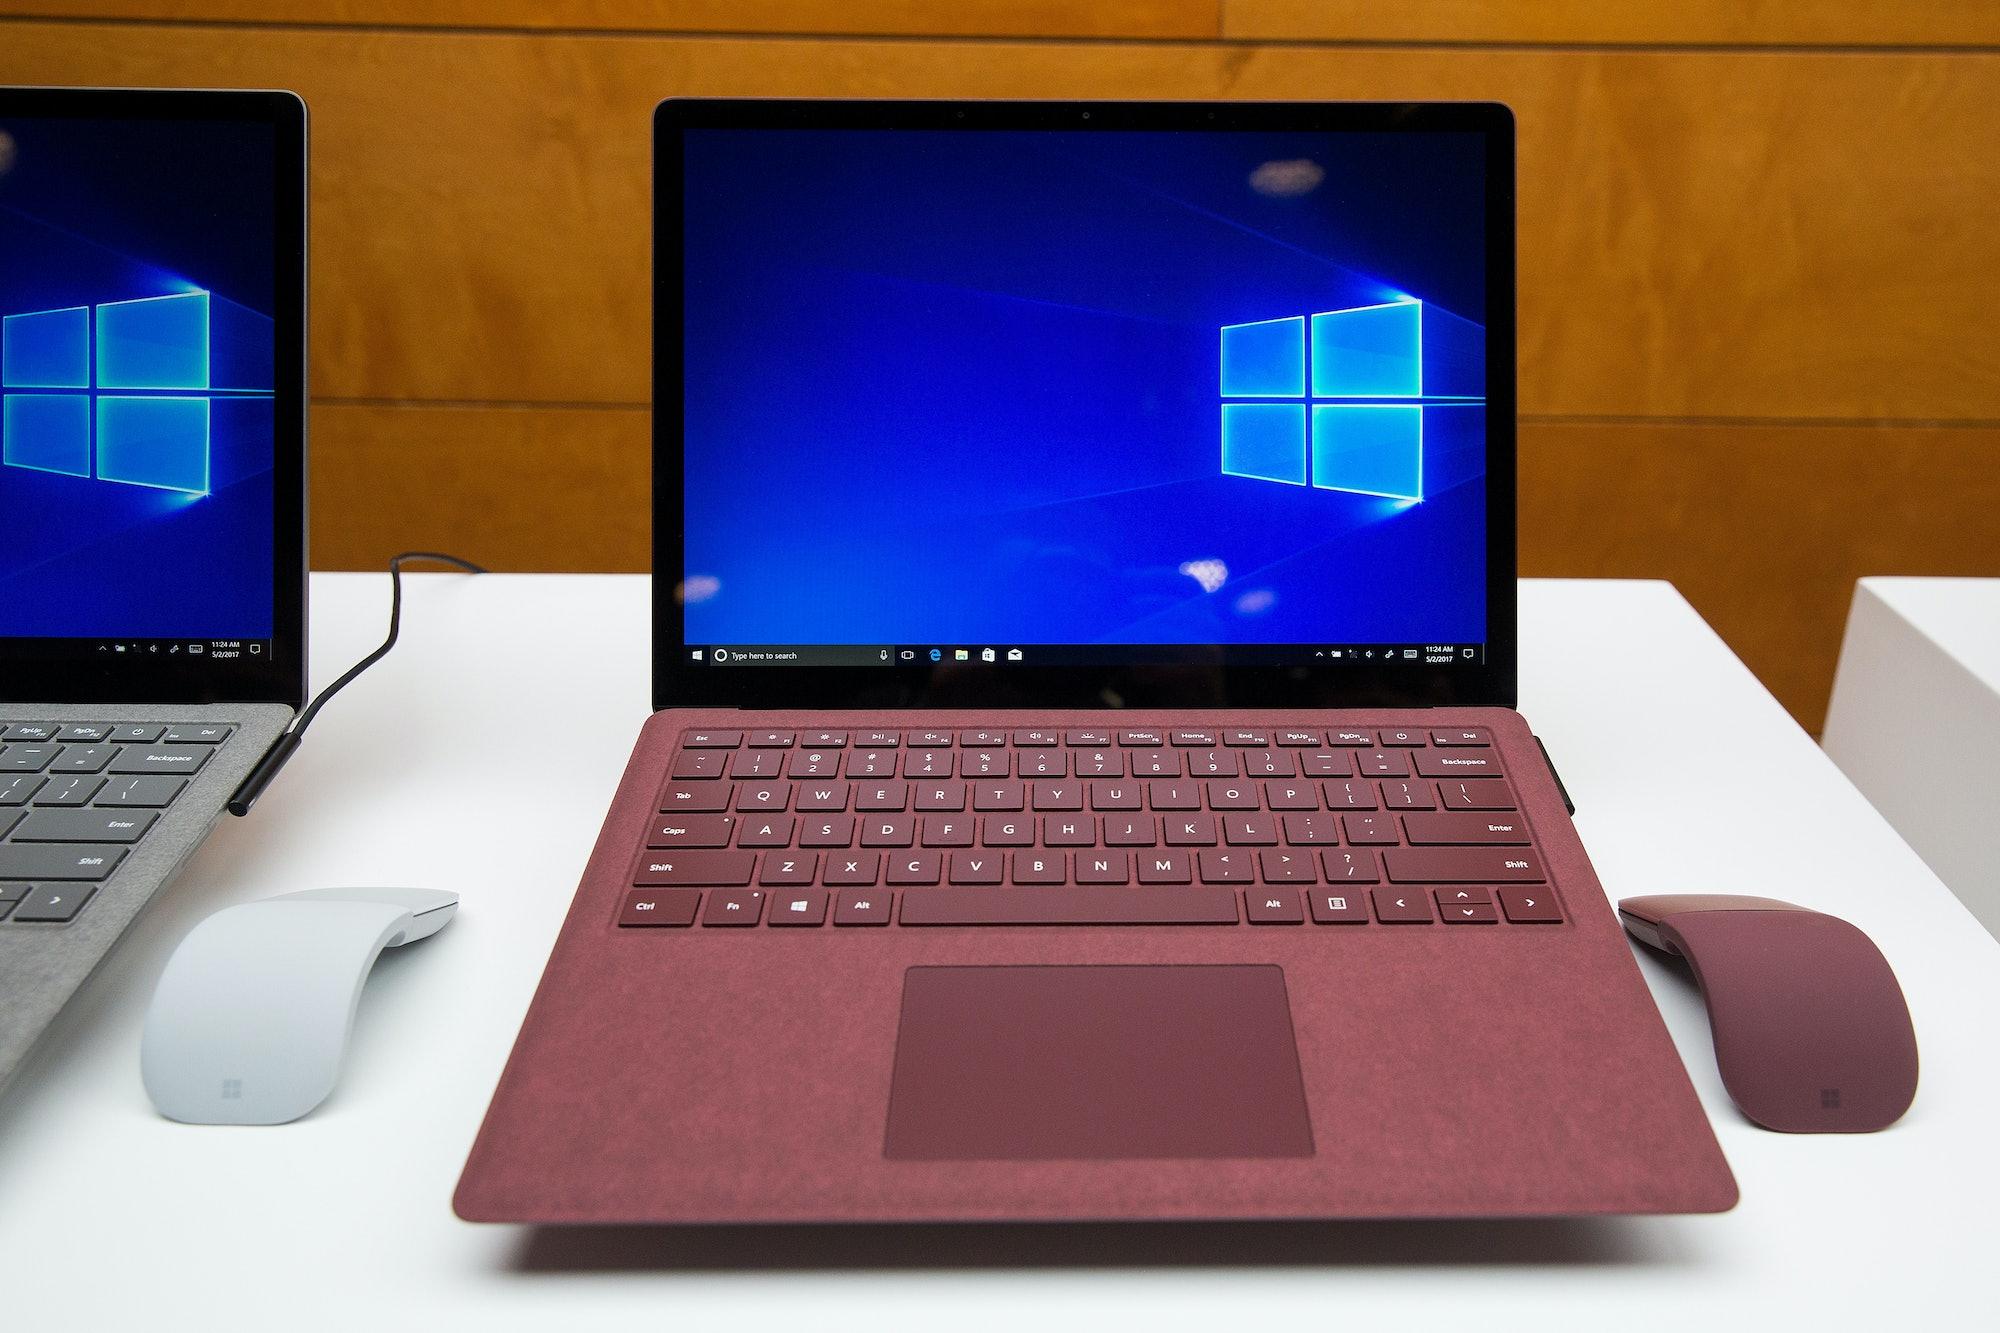 A Microsoft Surface Laptop running Windows 10 with Cortana.